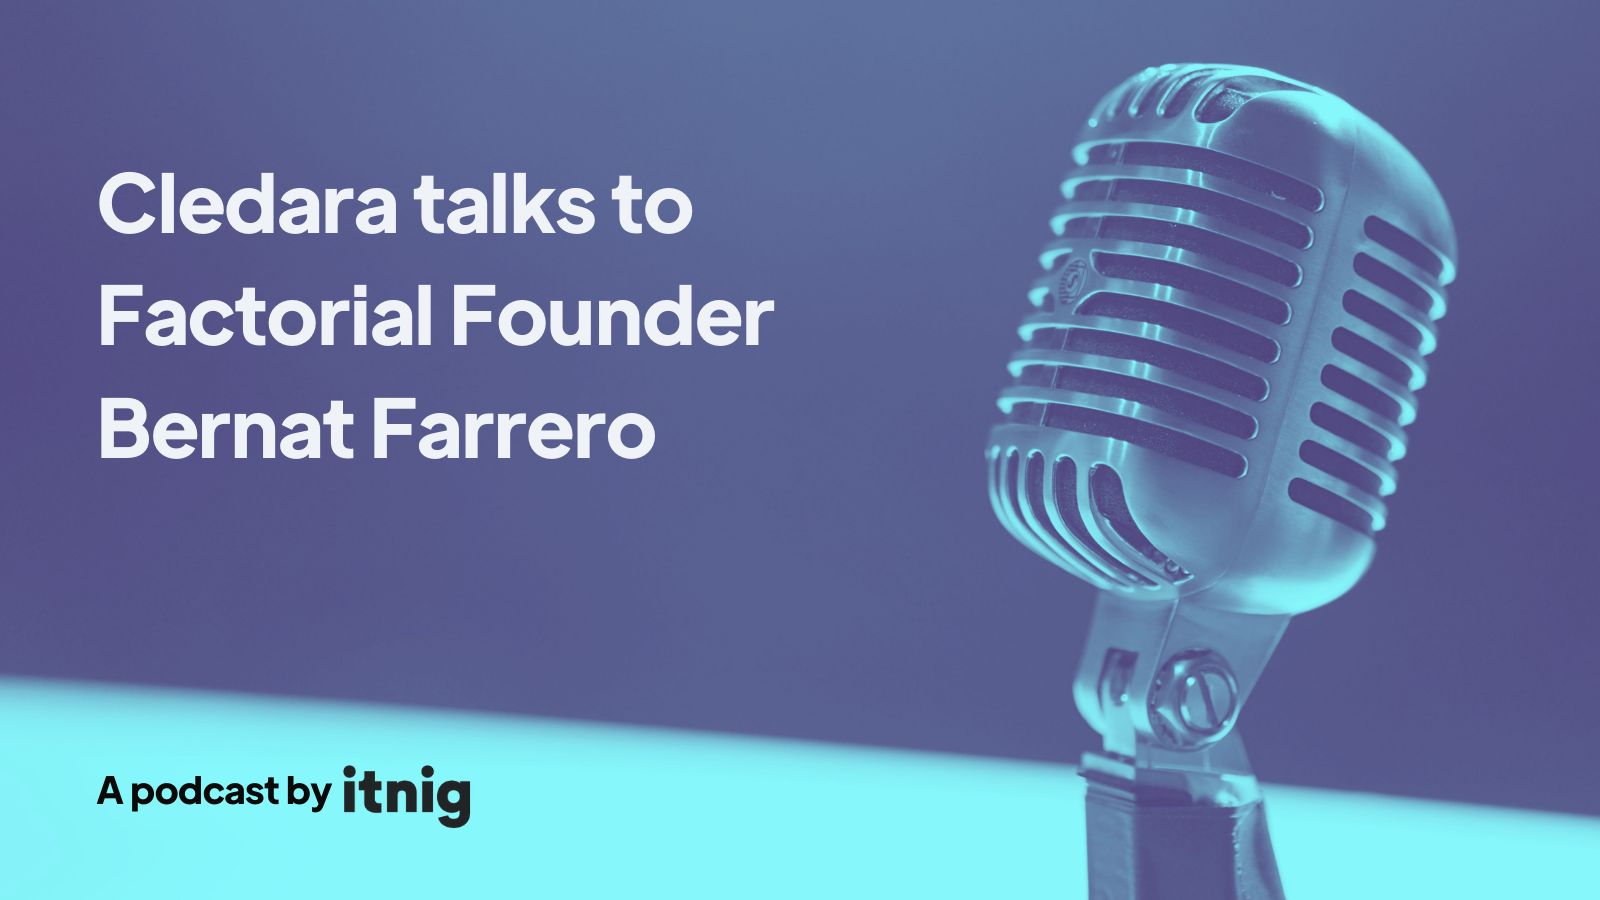 Itnig Podcast: Cledara talks to Factorial Founder Bernat Farrero